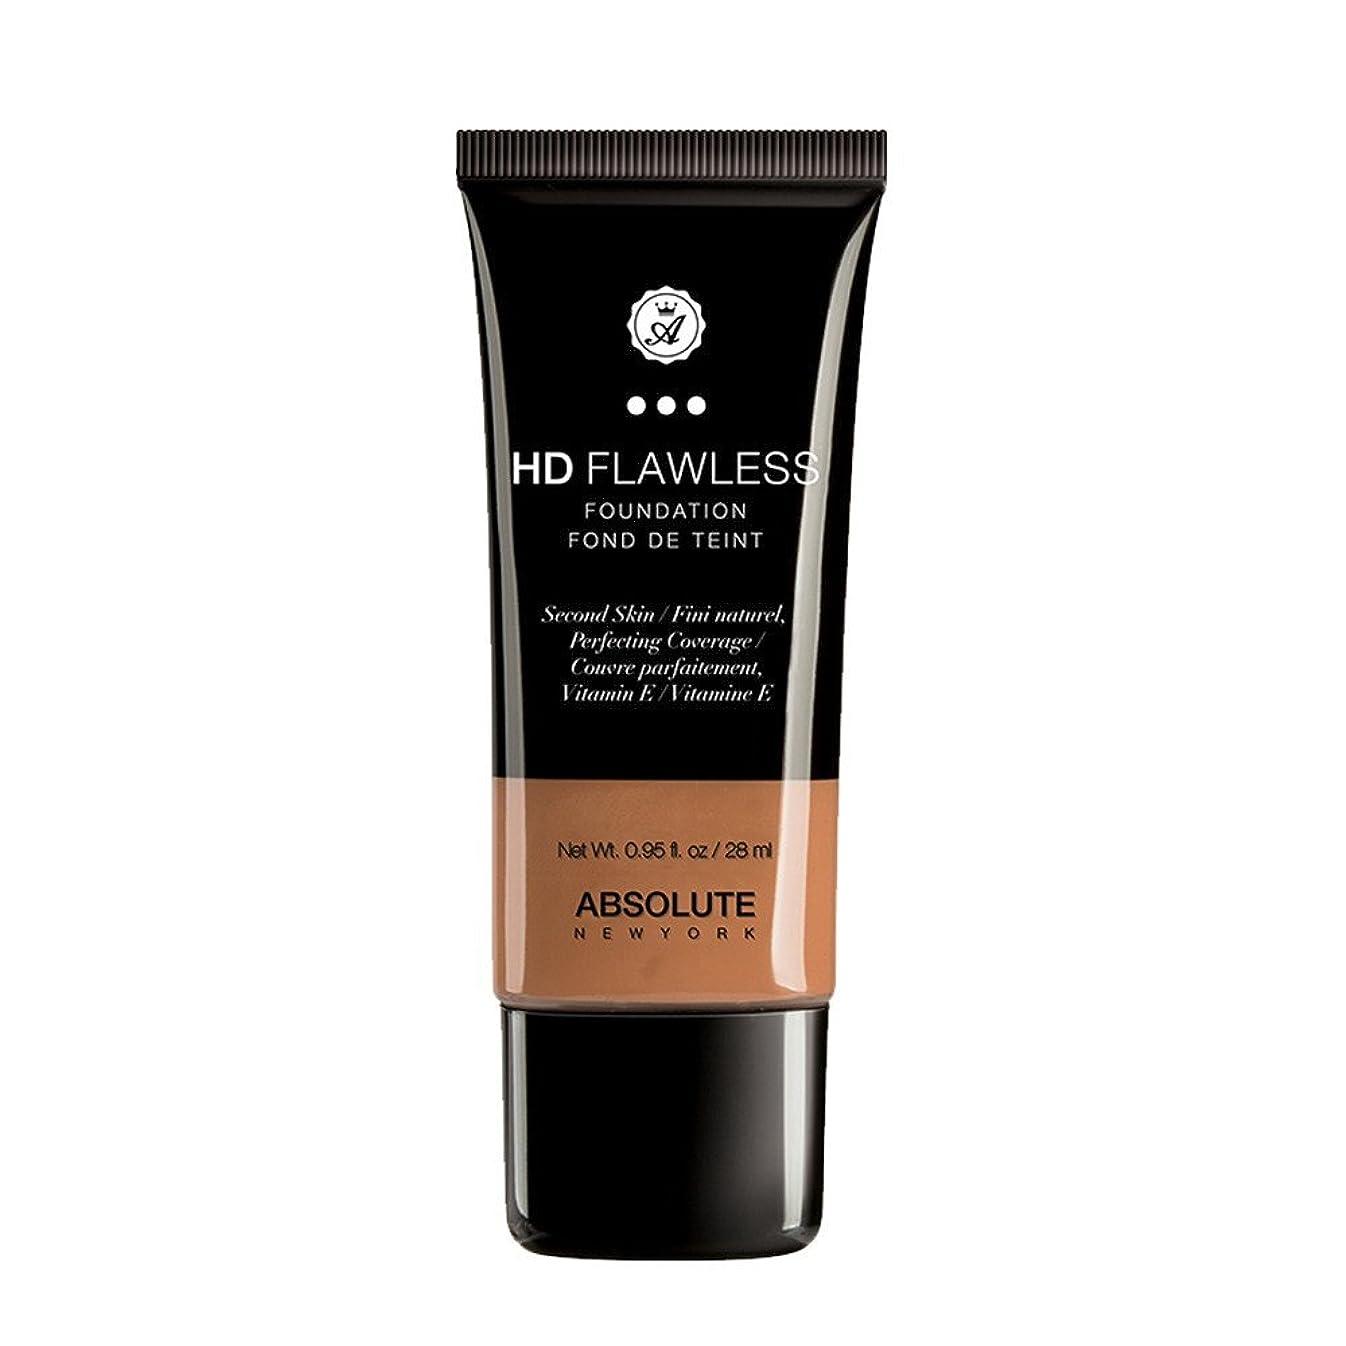 平凡陸軍必須(3 Pack) ABSOLUTE HD Flawless Fluid Foundation - Almond (並行輸入品)